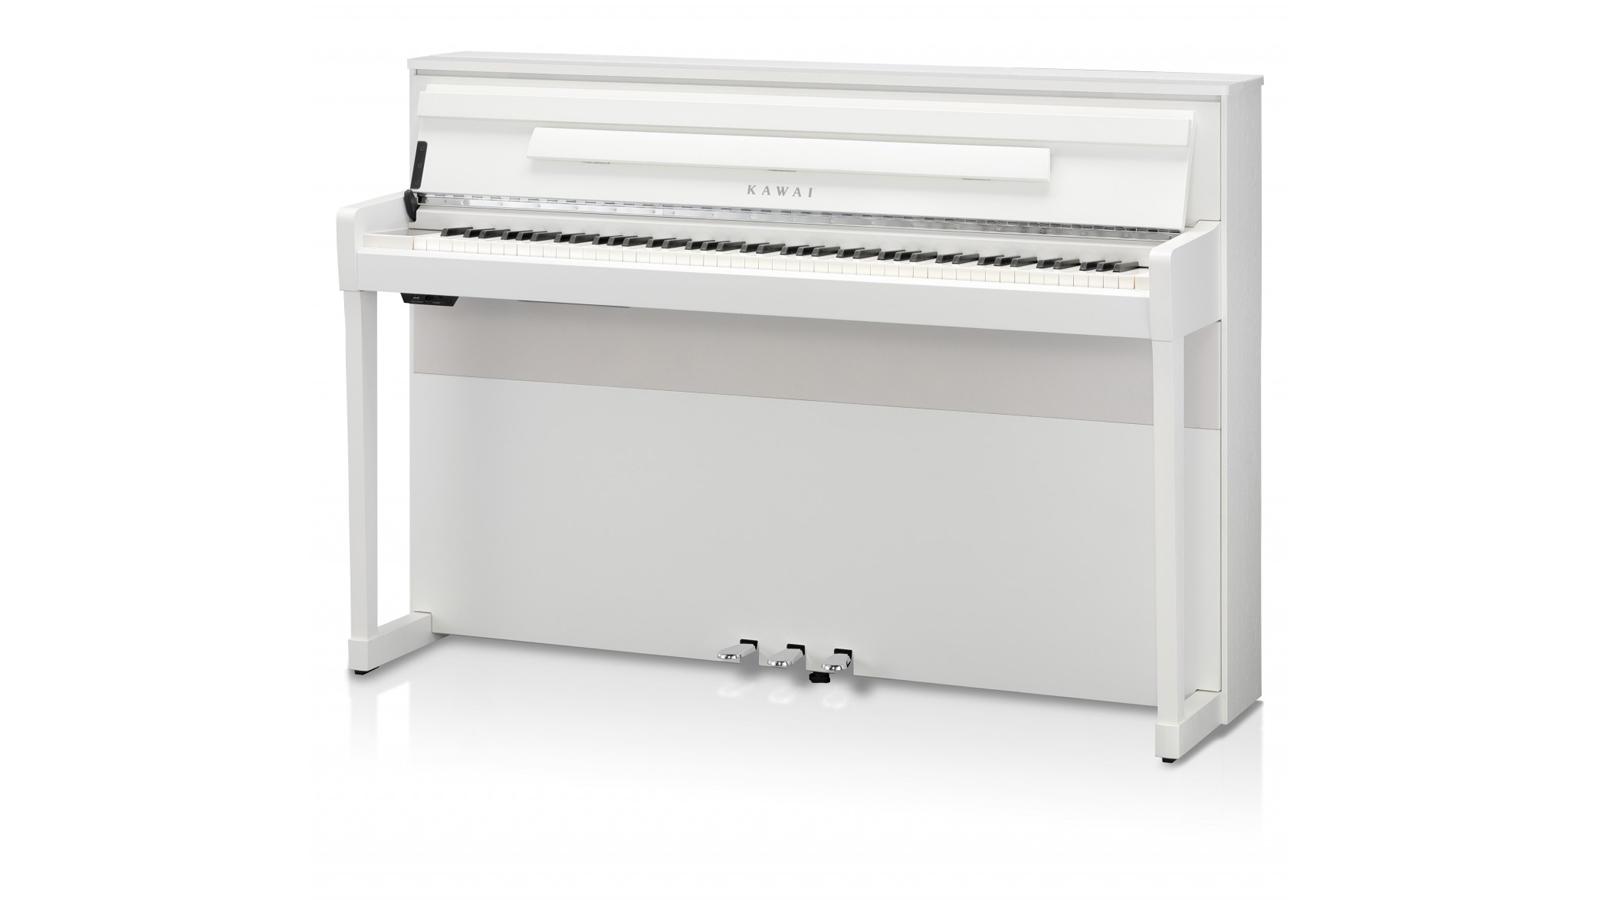 Kawai CA-99 WH Digitalpiano mit Resonanzboden inkl. Aufbau